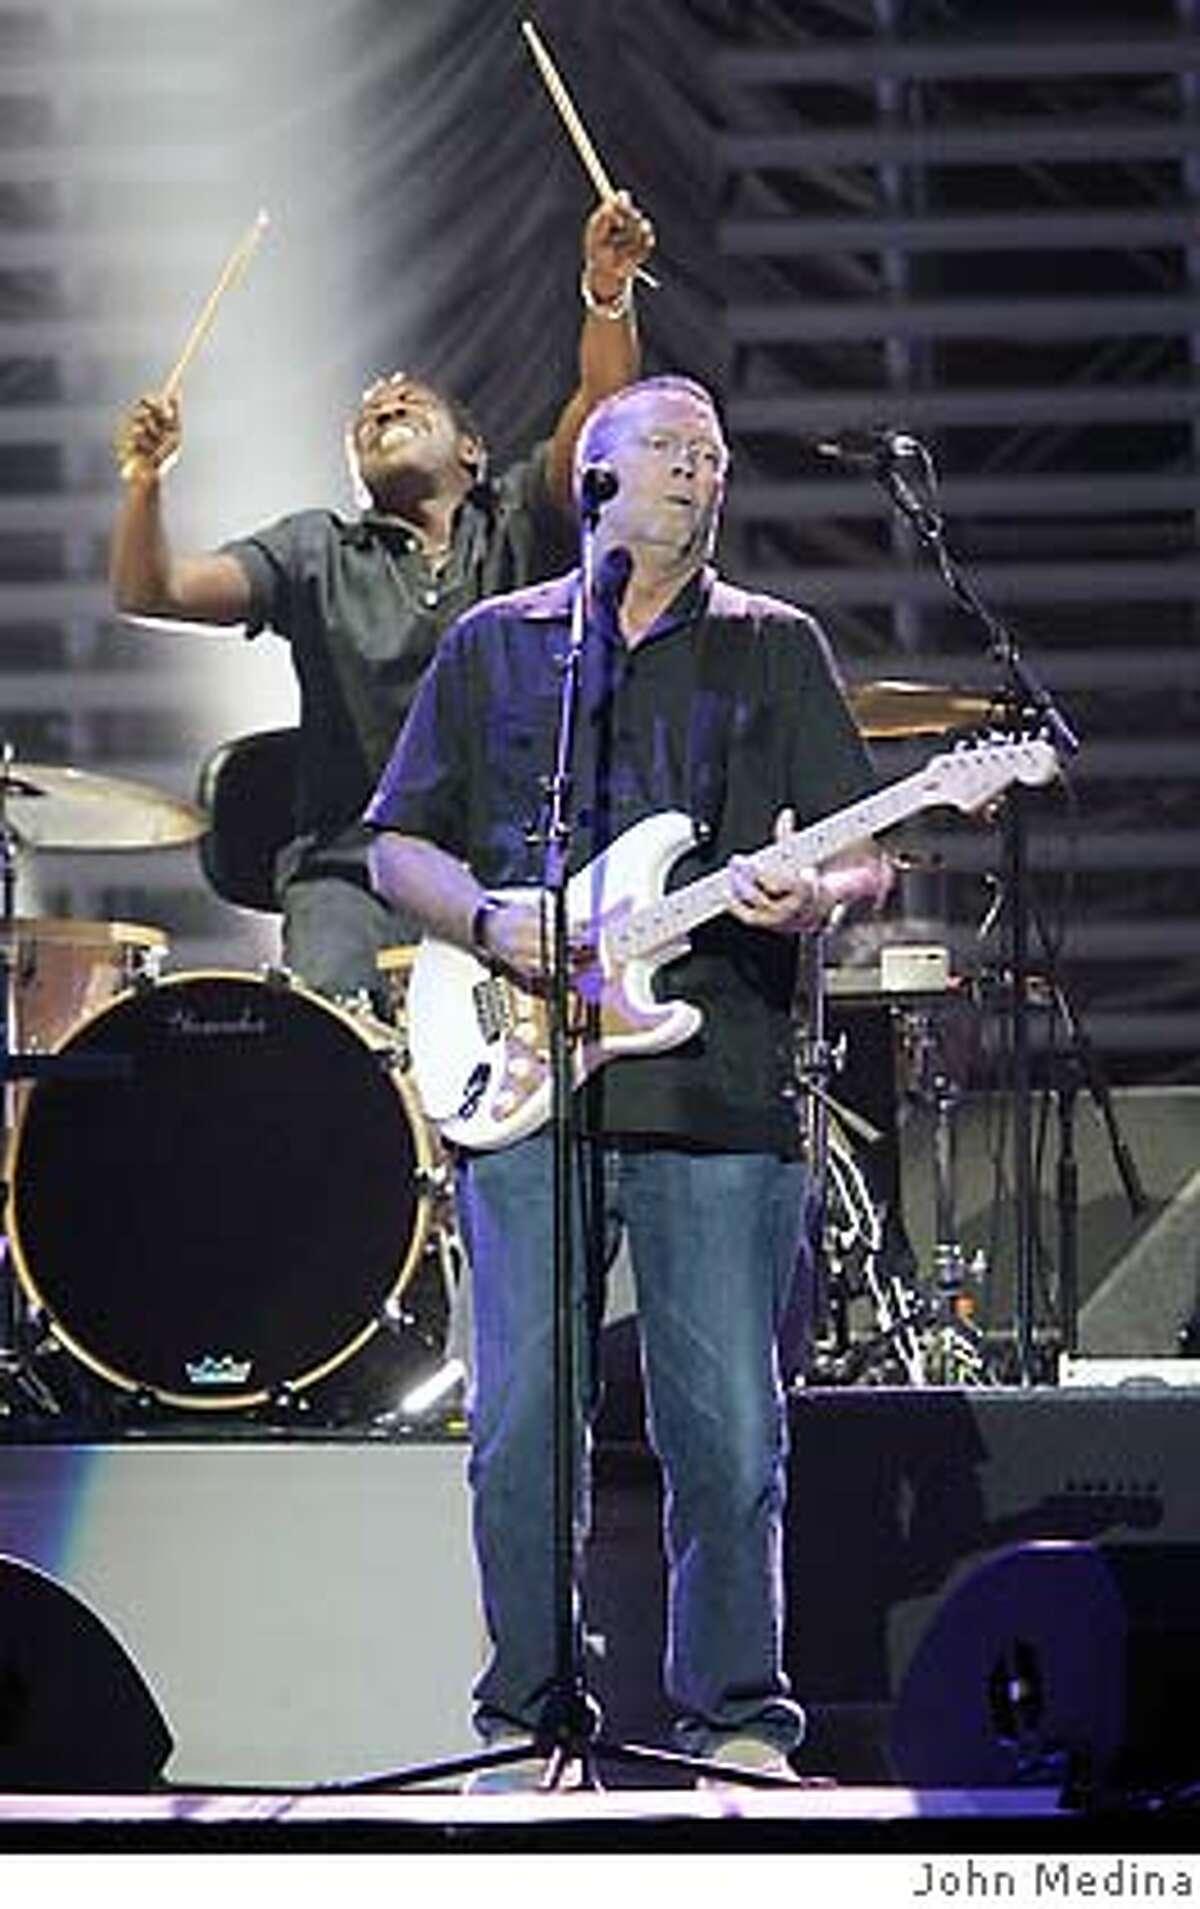 Eric Clapton at HP Pavilion March 18, 2007 photography by John Medina